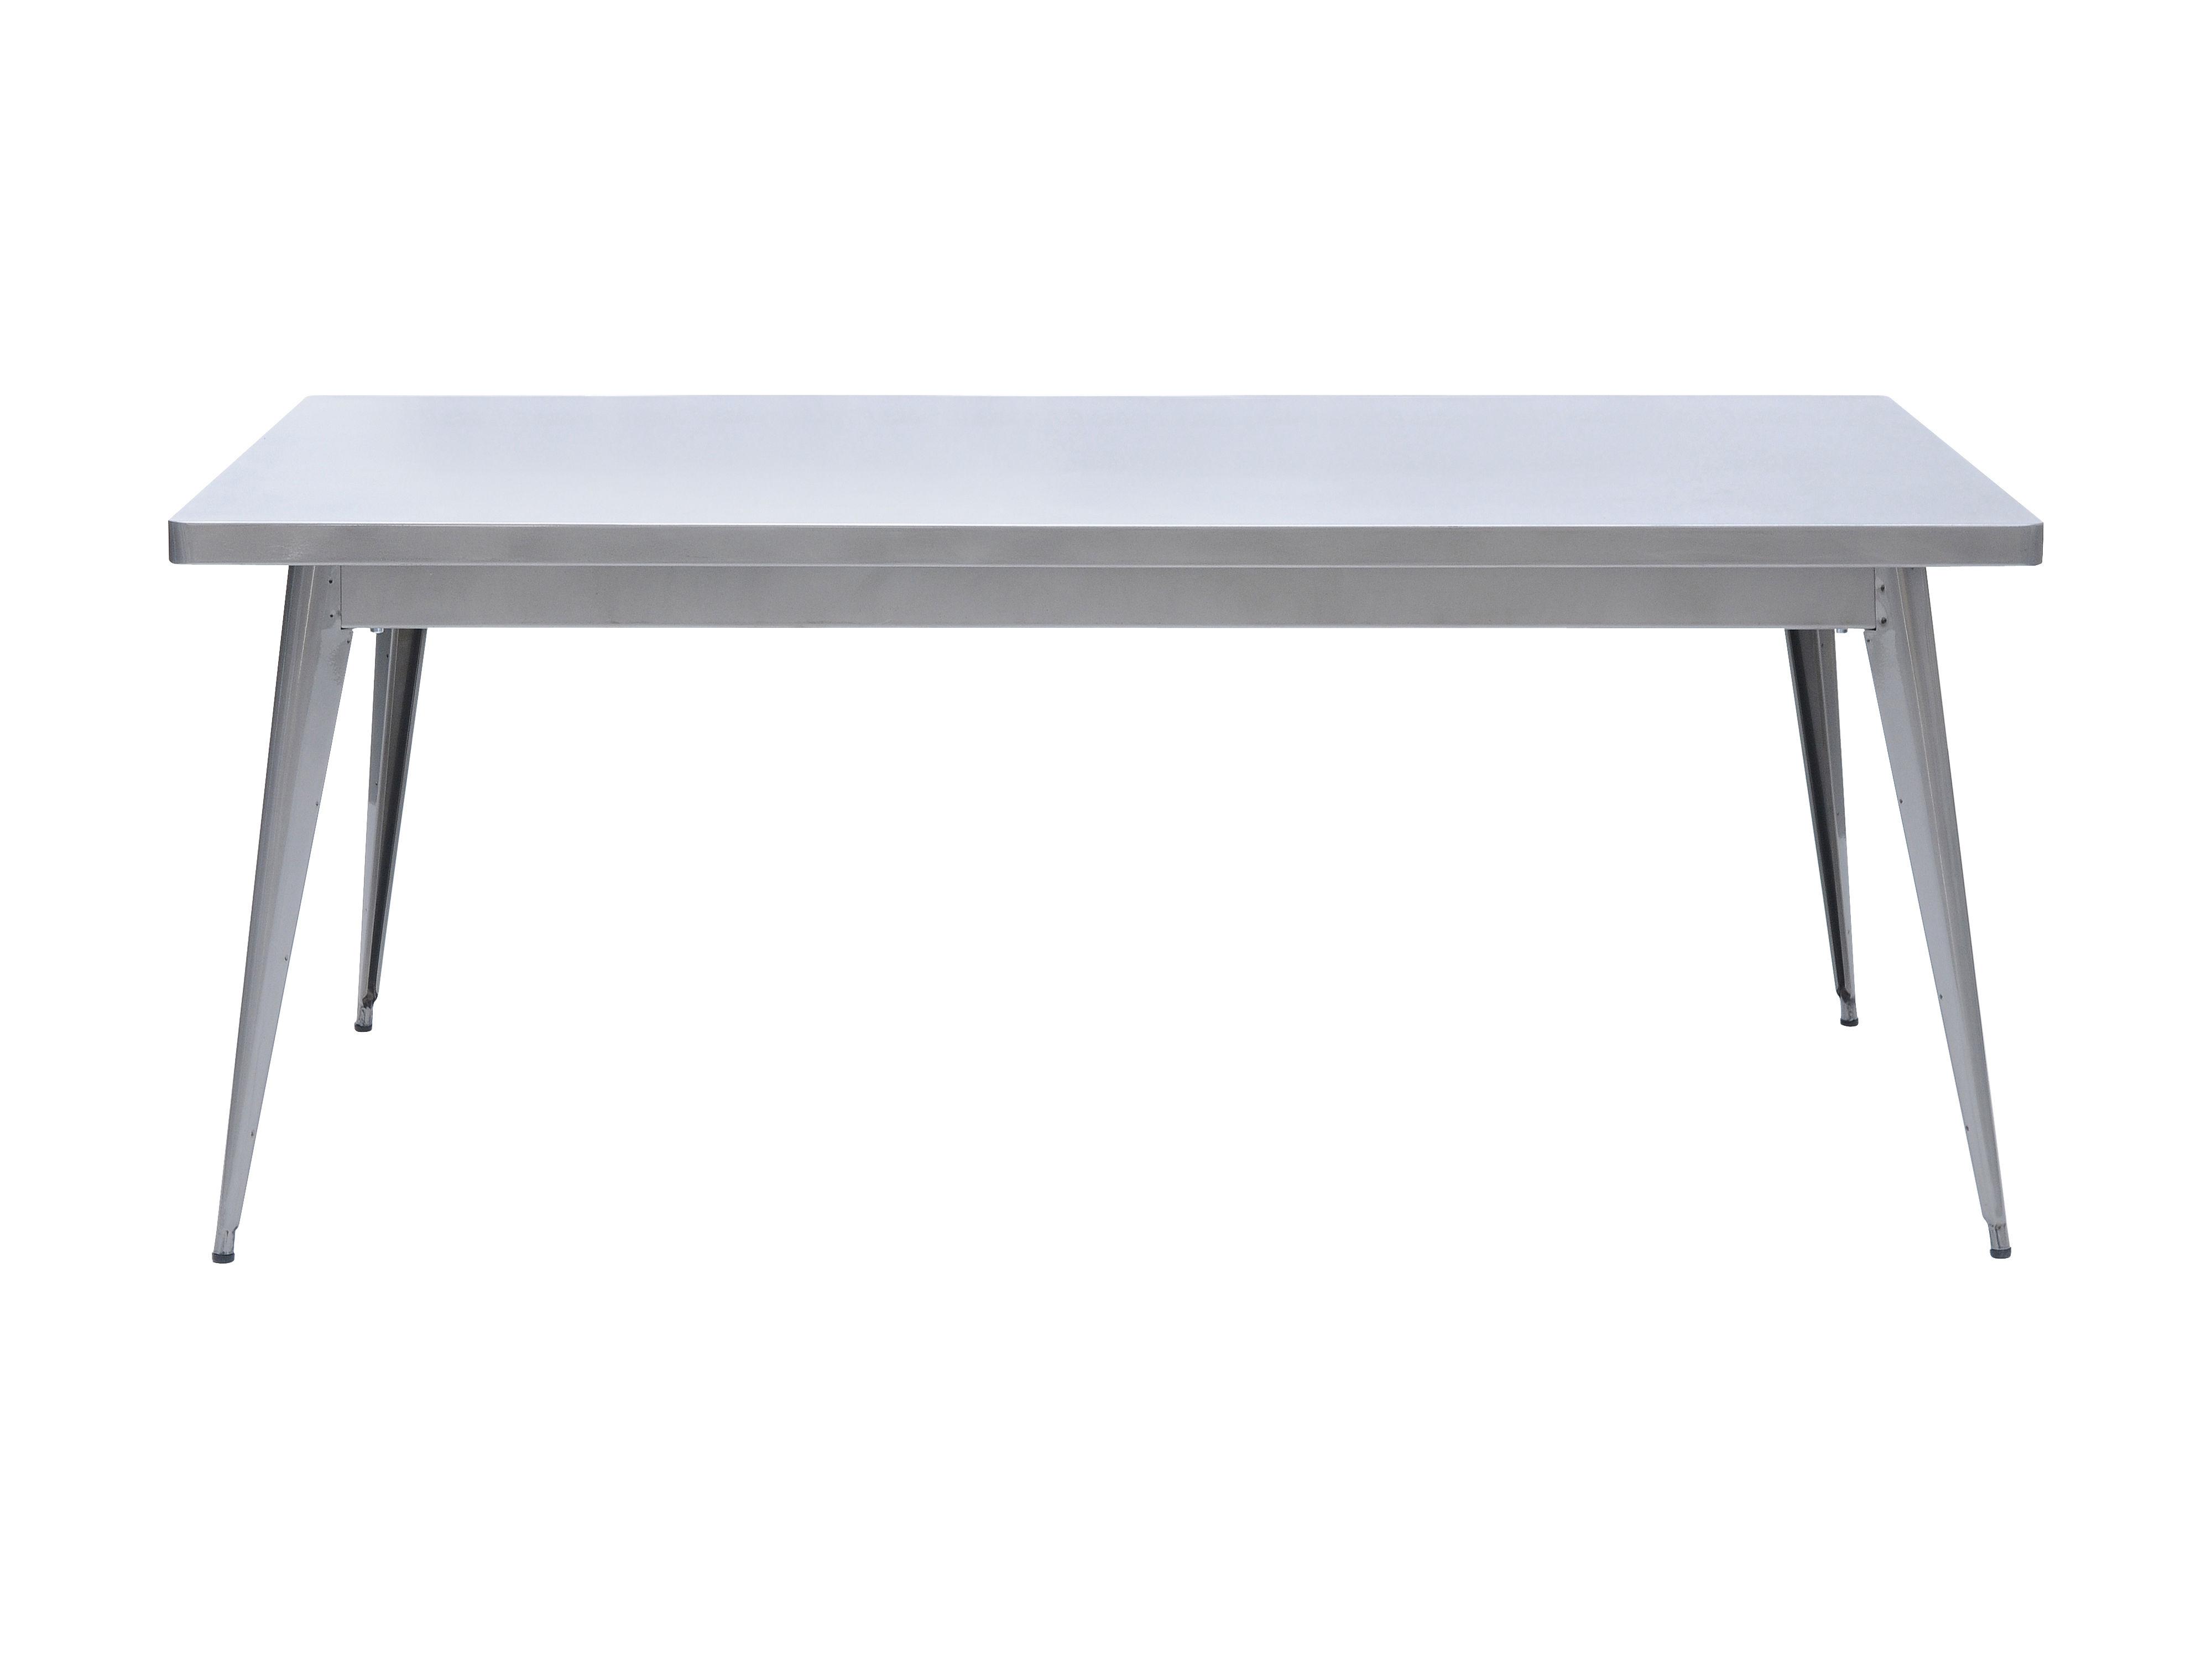 Rentrée 2011 UK - Bureau design - Tavolo rettangolare 55 - L 130 x larg 70 cm di Tolix - 130 x 70 cm - Vernice grezza brillante - Acier brut verni brillant